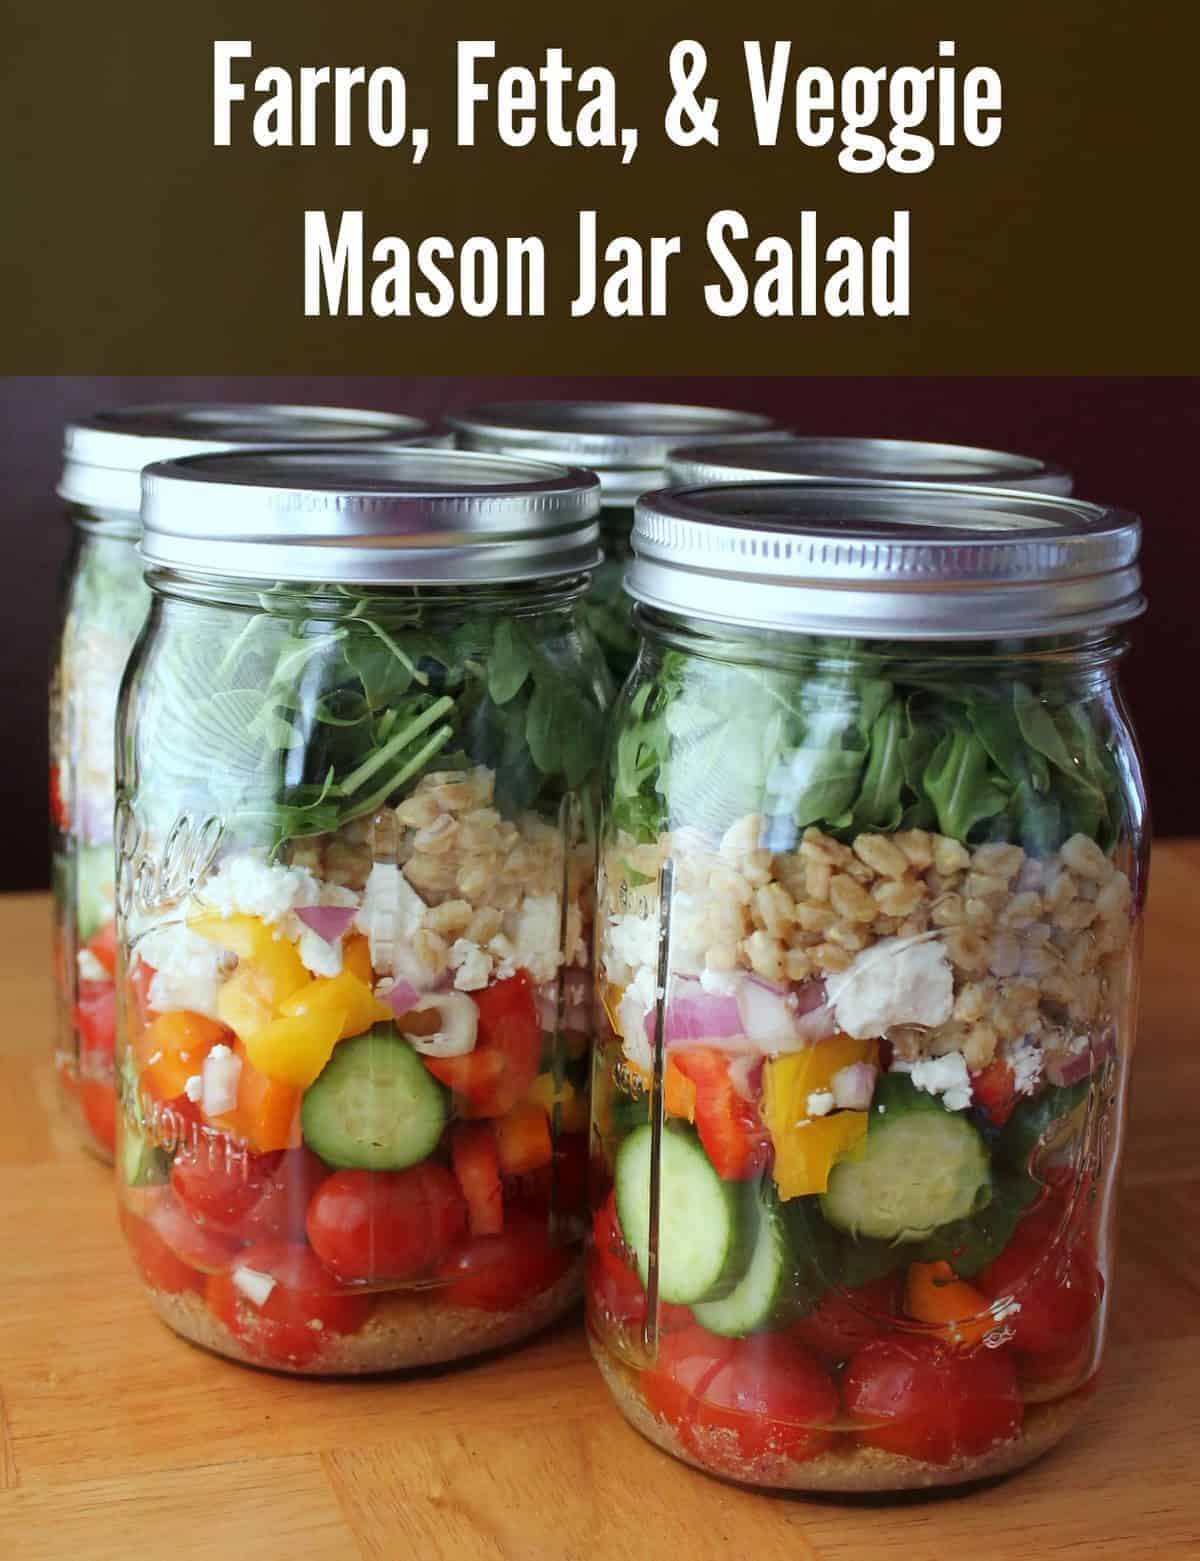 Mason Jar Salad: Farro, Feta, and Vegetables